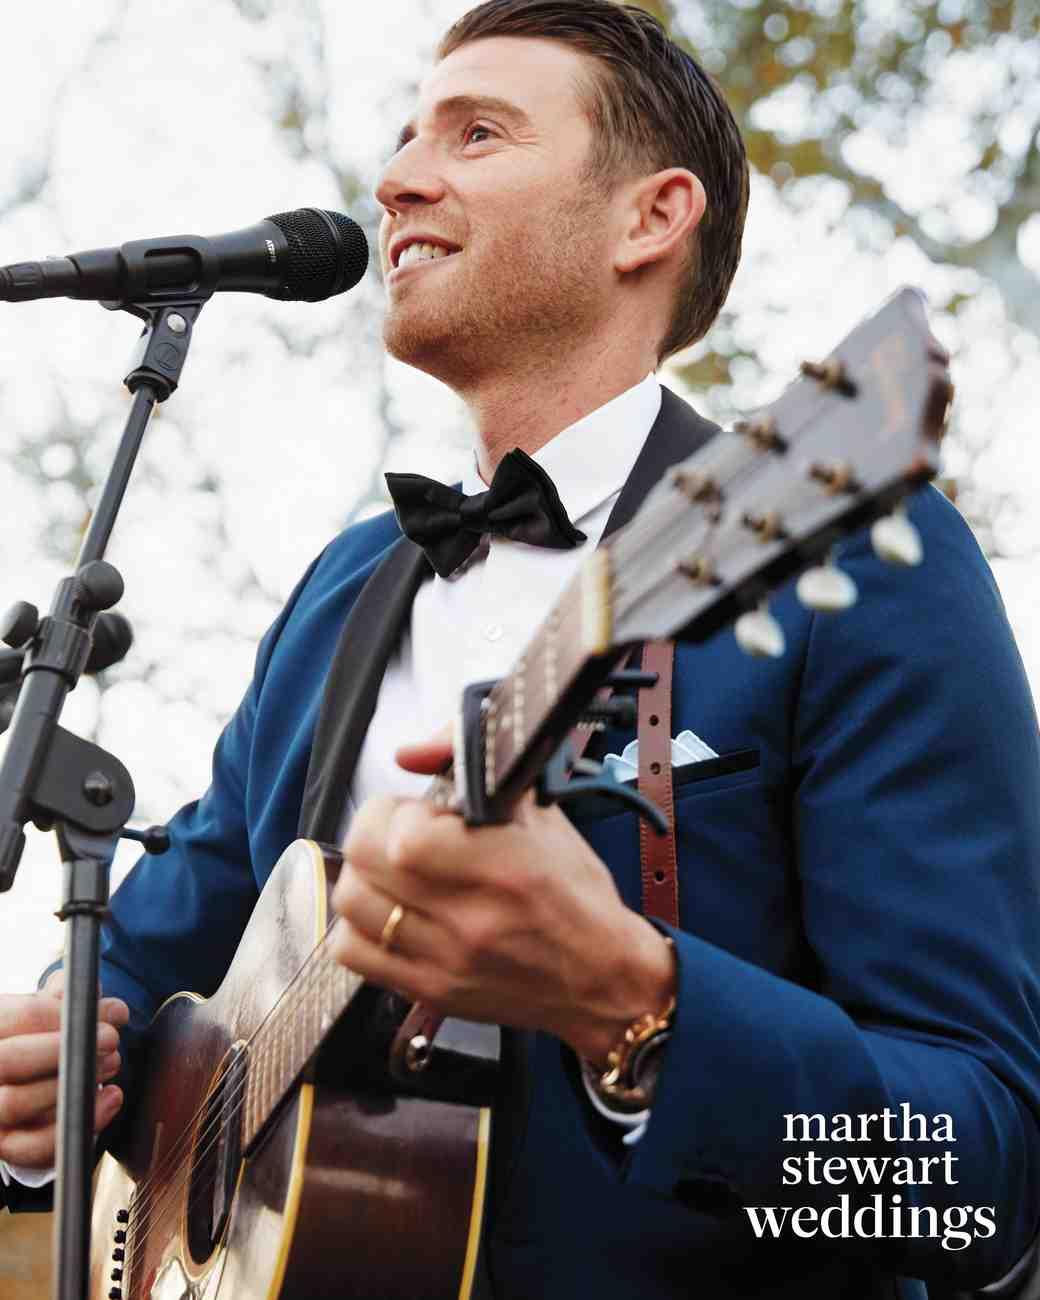 jamie-bryan-wedding-25-cocktails-singing-3389-d112664.jpg